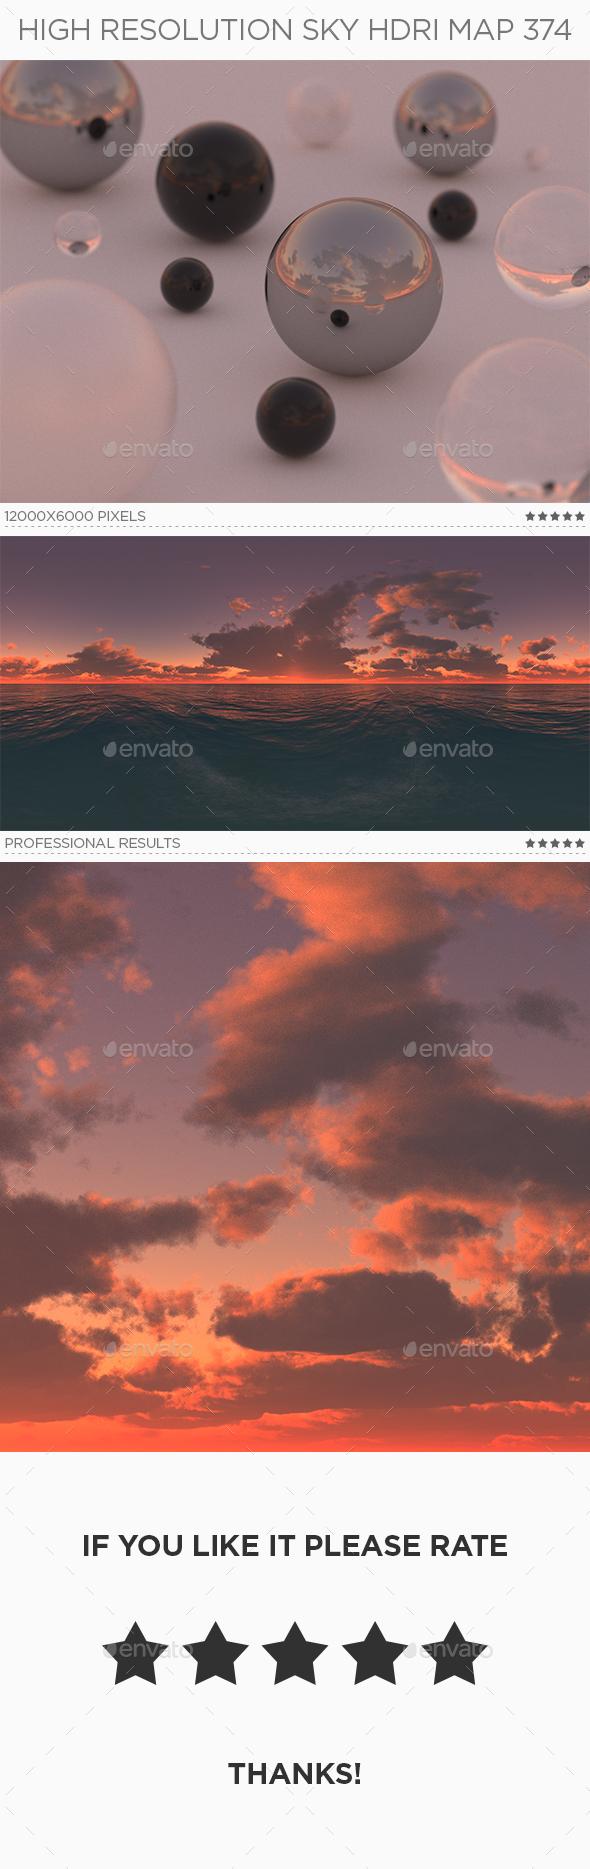 High Resolution Sky HDRi Map 374 - 3DOcean Item for Sale